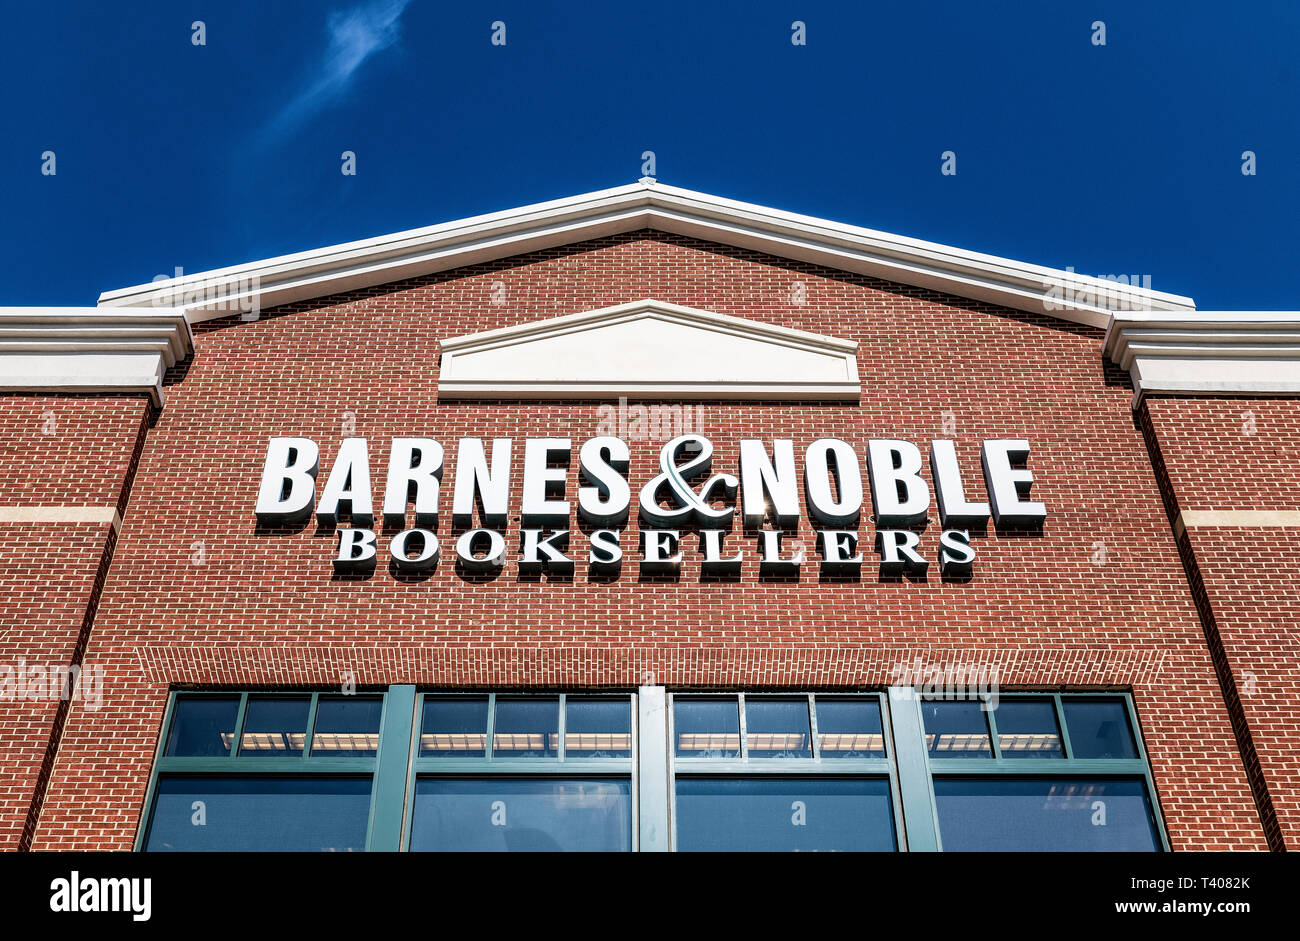 Exterior of Barnes and Noble bookstore, Mall of Georgia, Beuford, Georgia, USA. - Stock Image